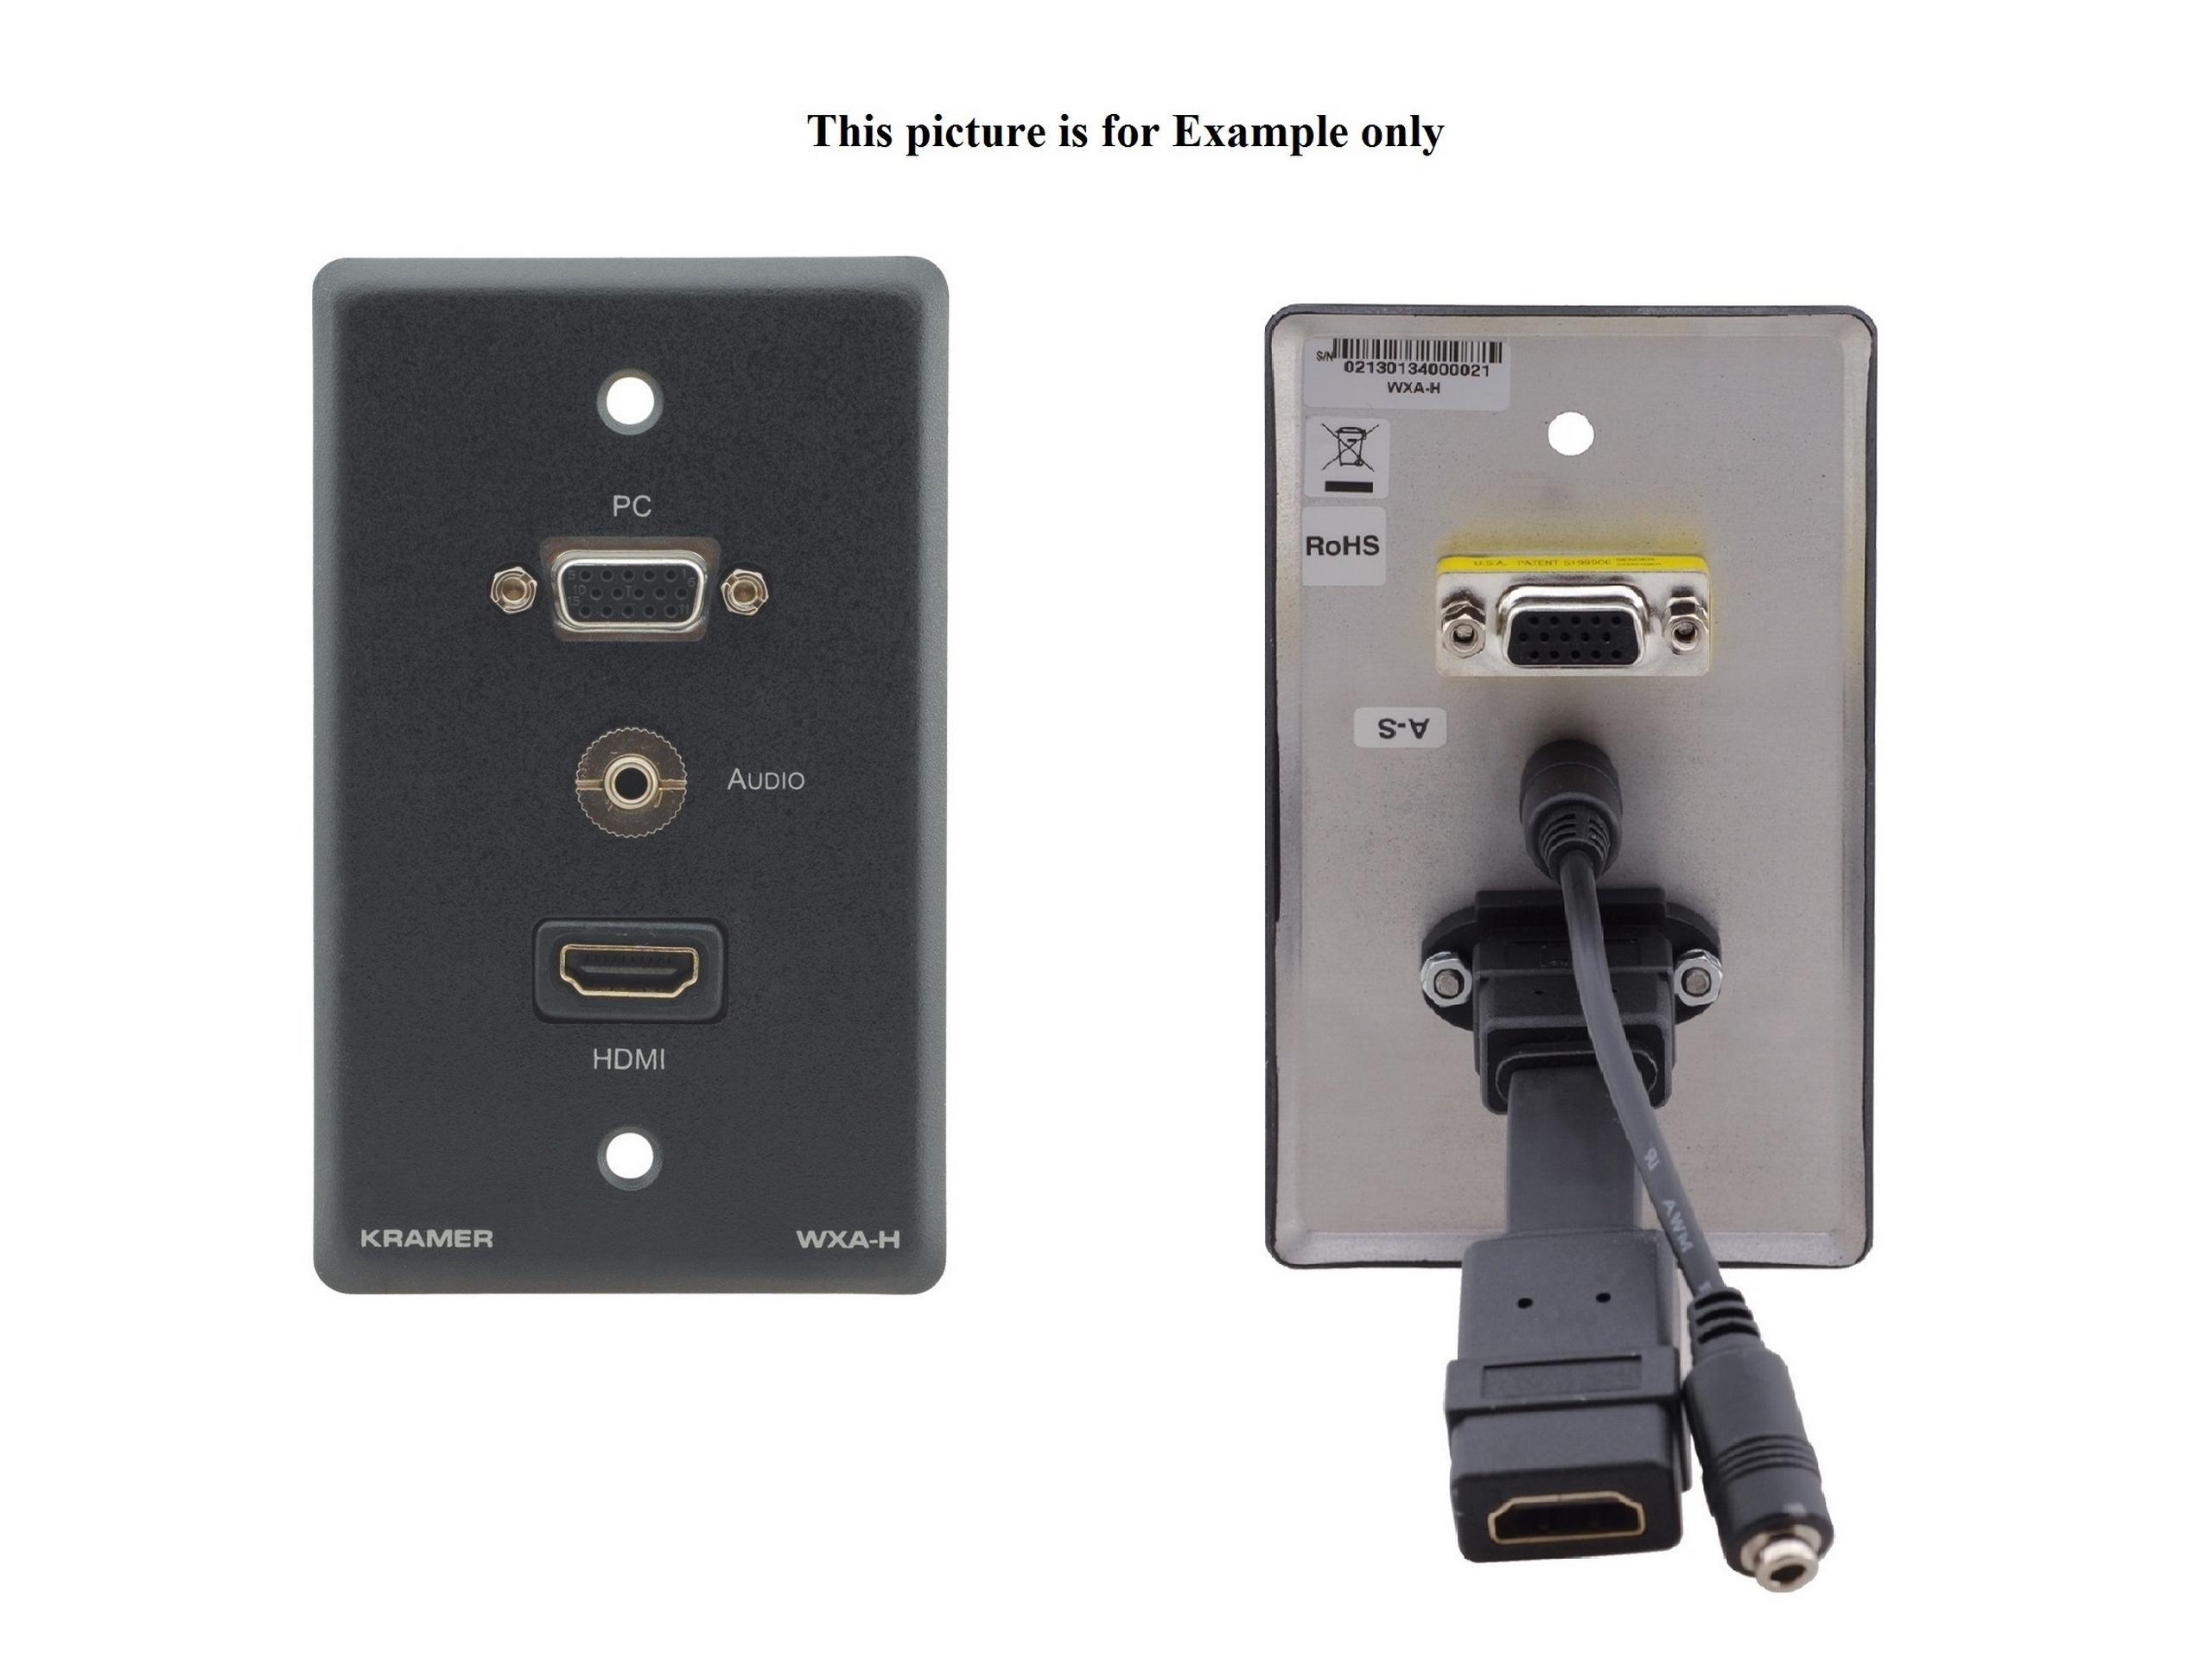 Kramer WXA-H-D(W) Passive Wall Plate/VGA 15-pin HD/3.5mm Audio/HDMI/White